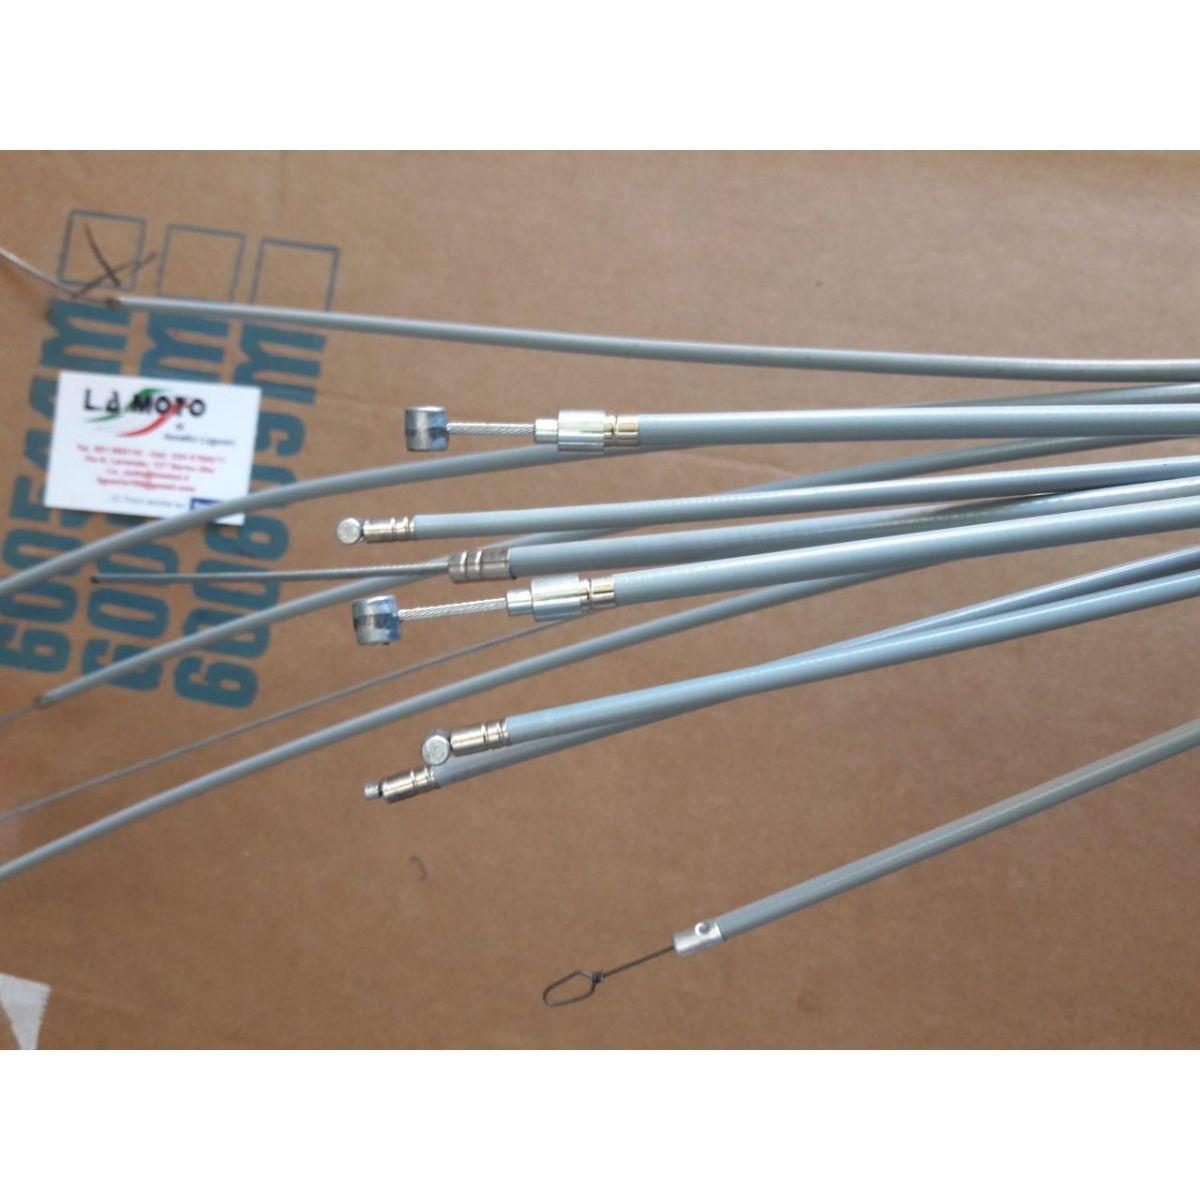 Serie cavi 7 pezzi grigi in teflon per trasmissioni VESPA 125 150 160 180 200 cc. VNB VNA VBB VBA SPRINT RALLY TS GTR SPRINT VEL